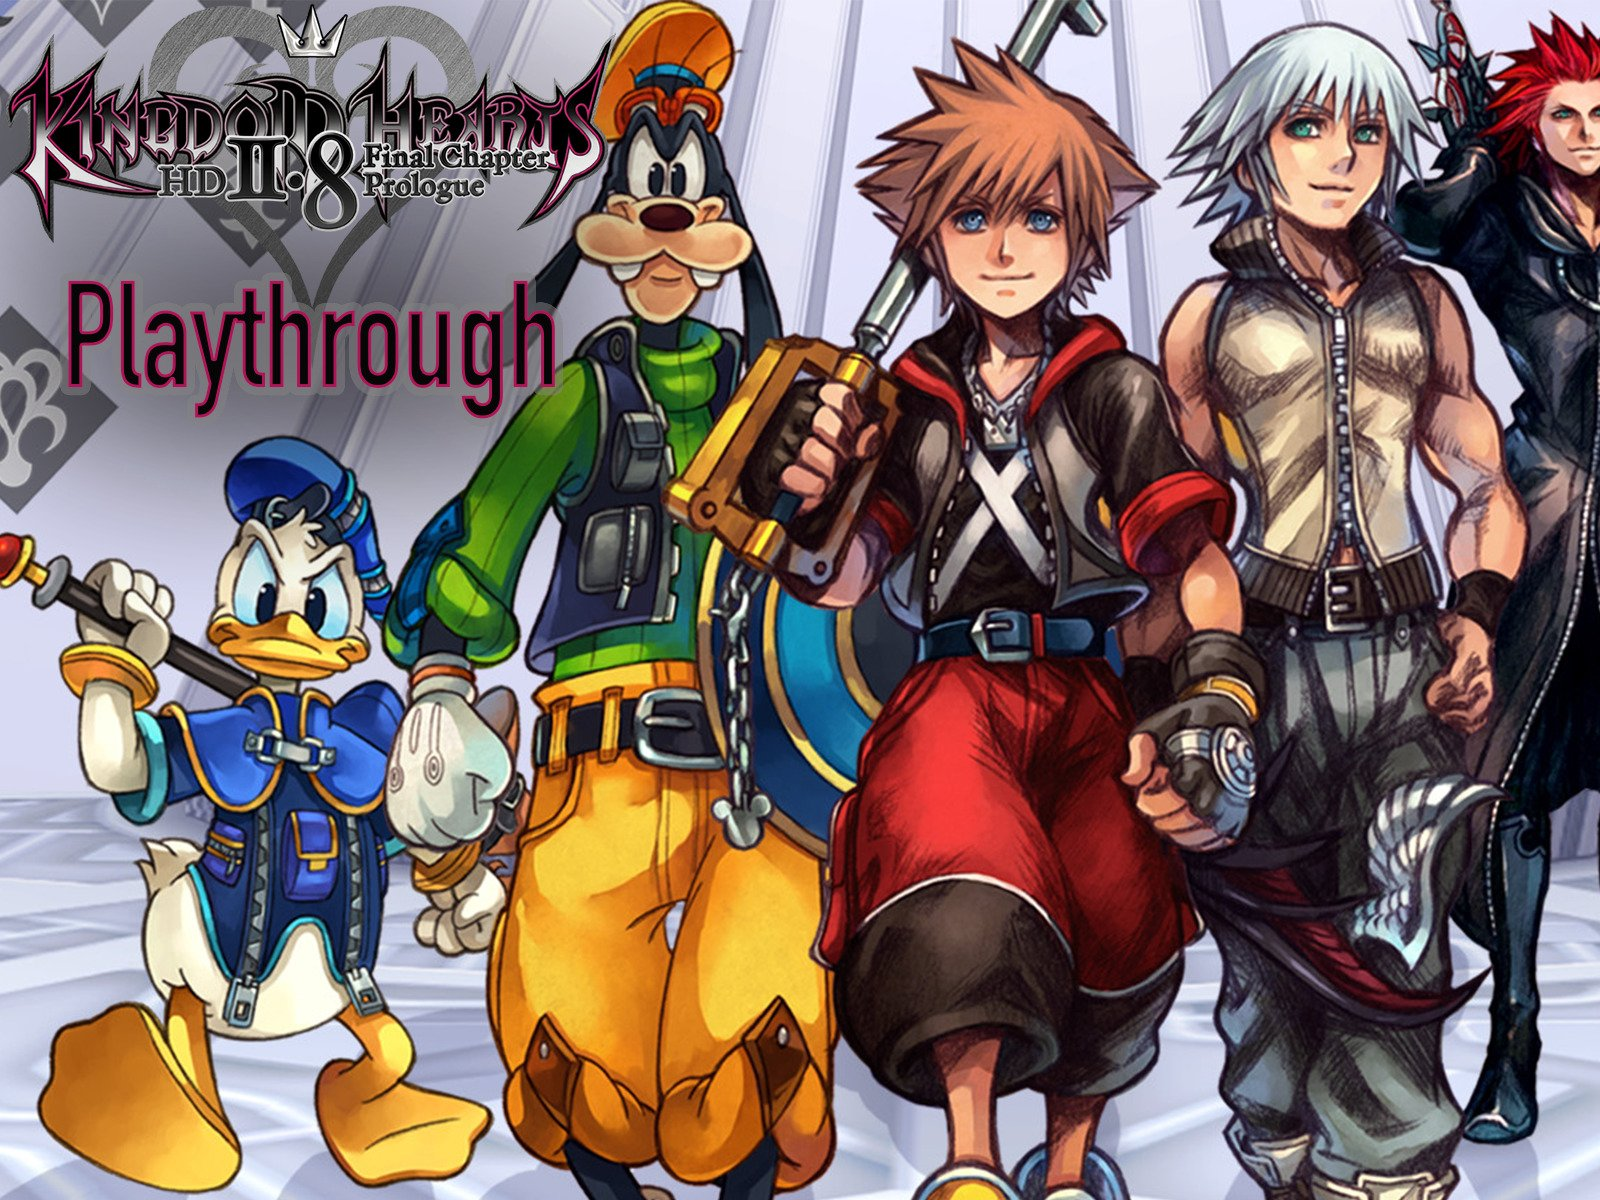 Kingdom Hearts HD 2.8 Final Chapter Prologue Playthrough - Season 1